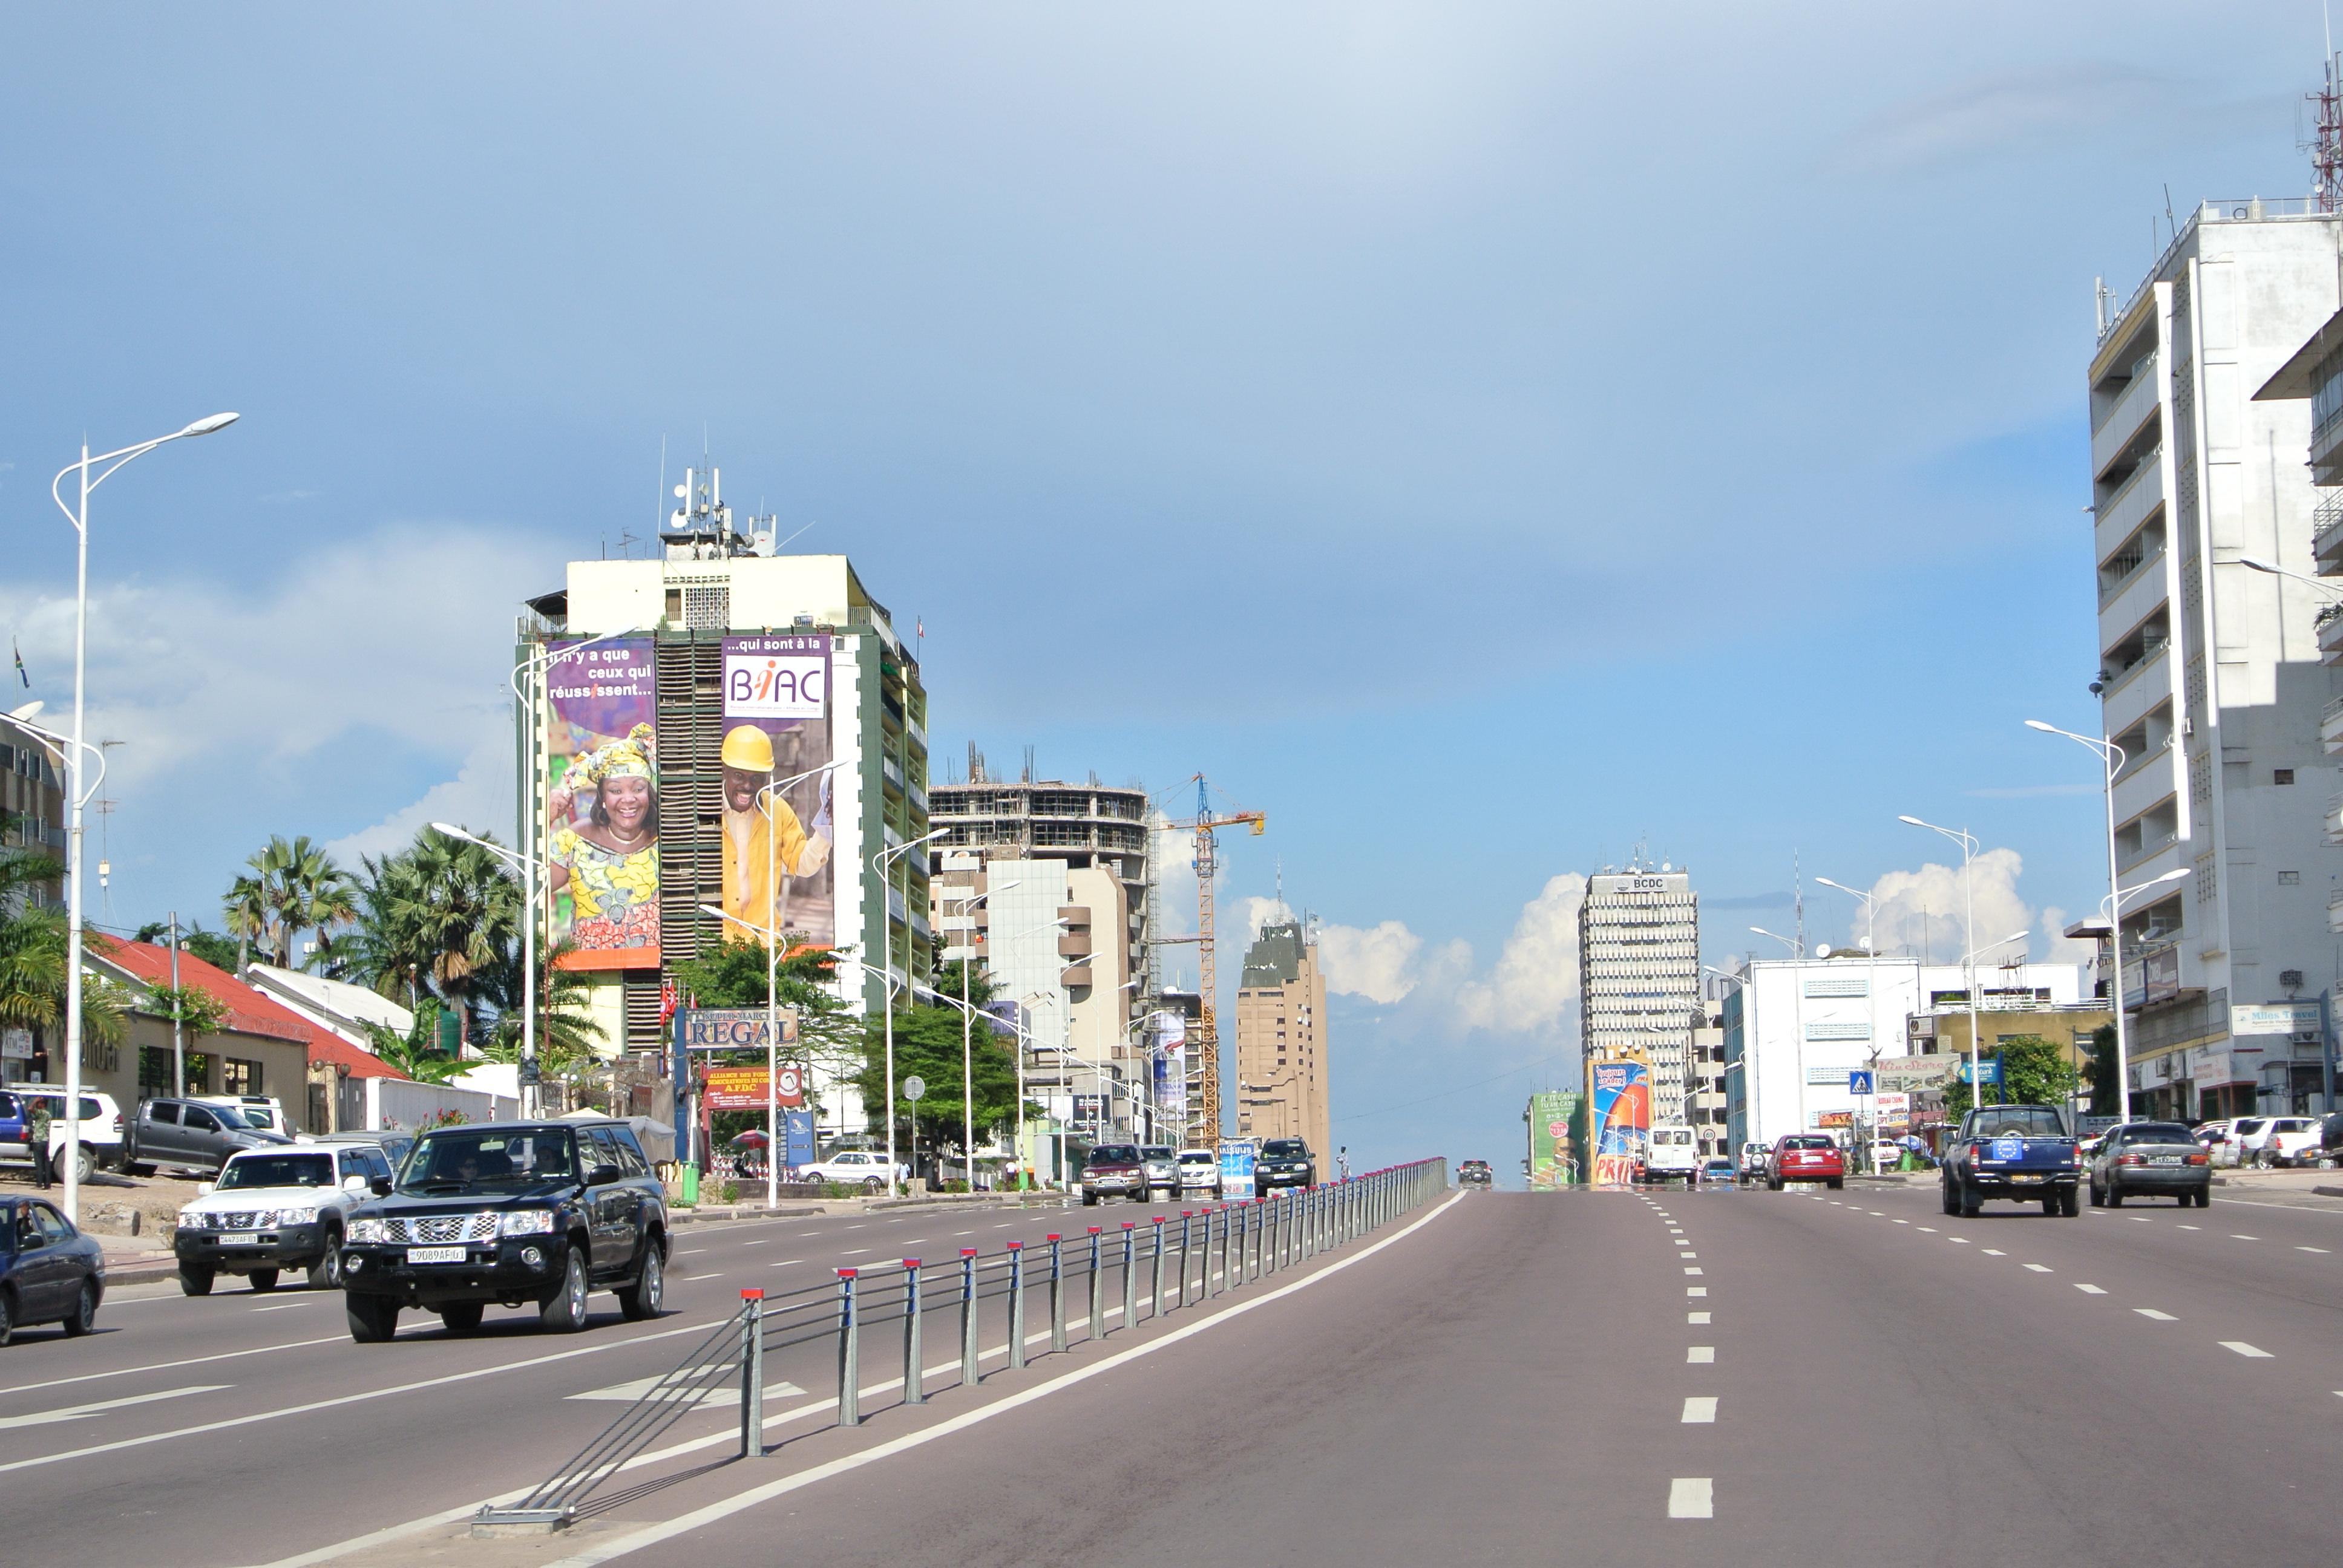 2013_Boulevard_du_30_Juin_Kinshasa_8756682965